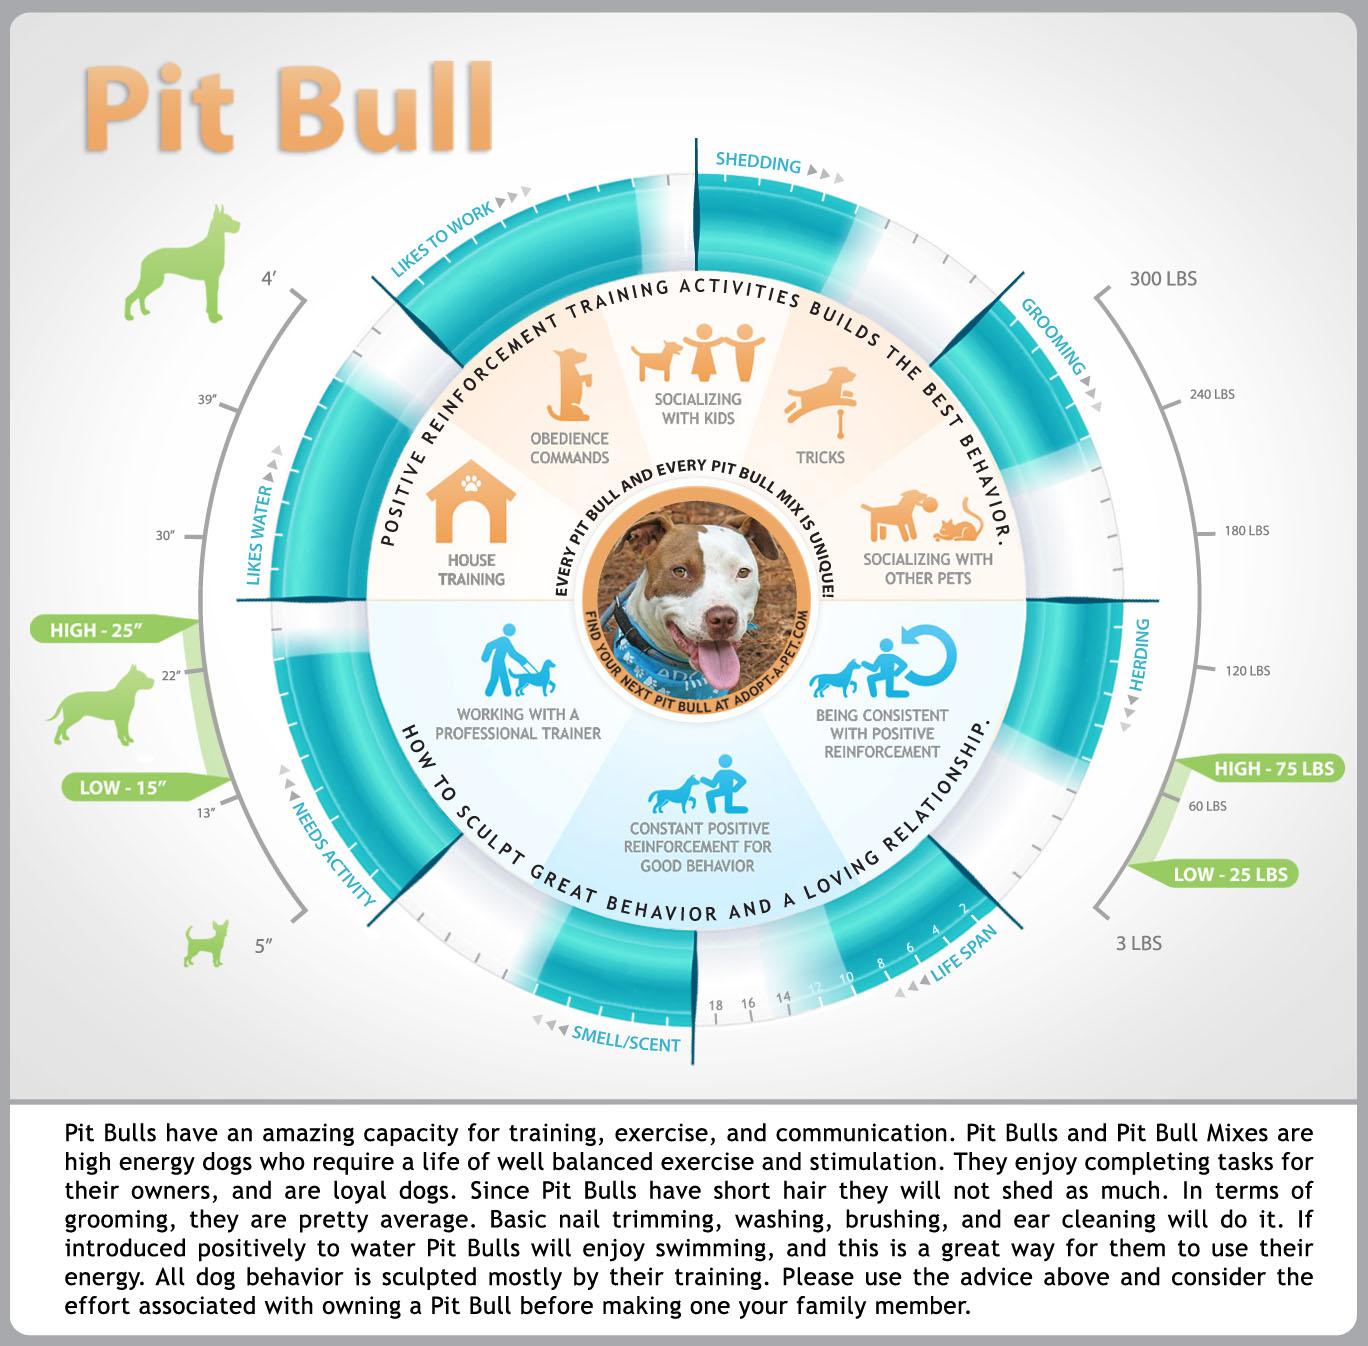 Pit Bull Sale Advice